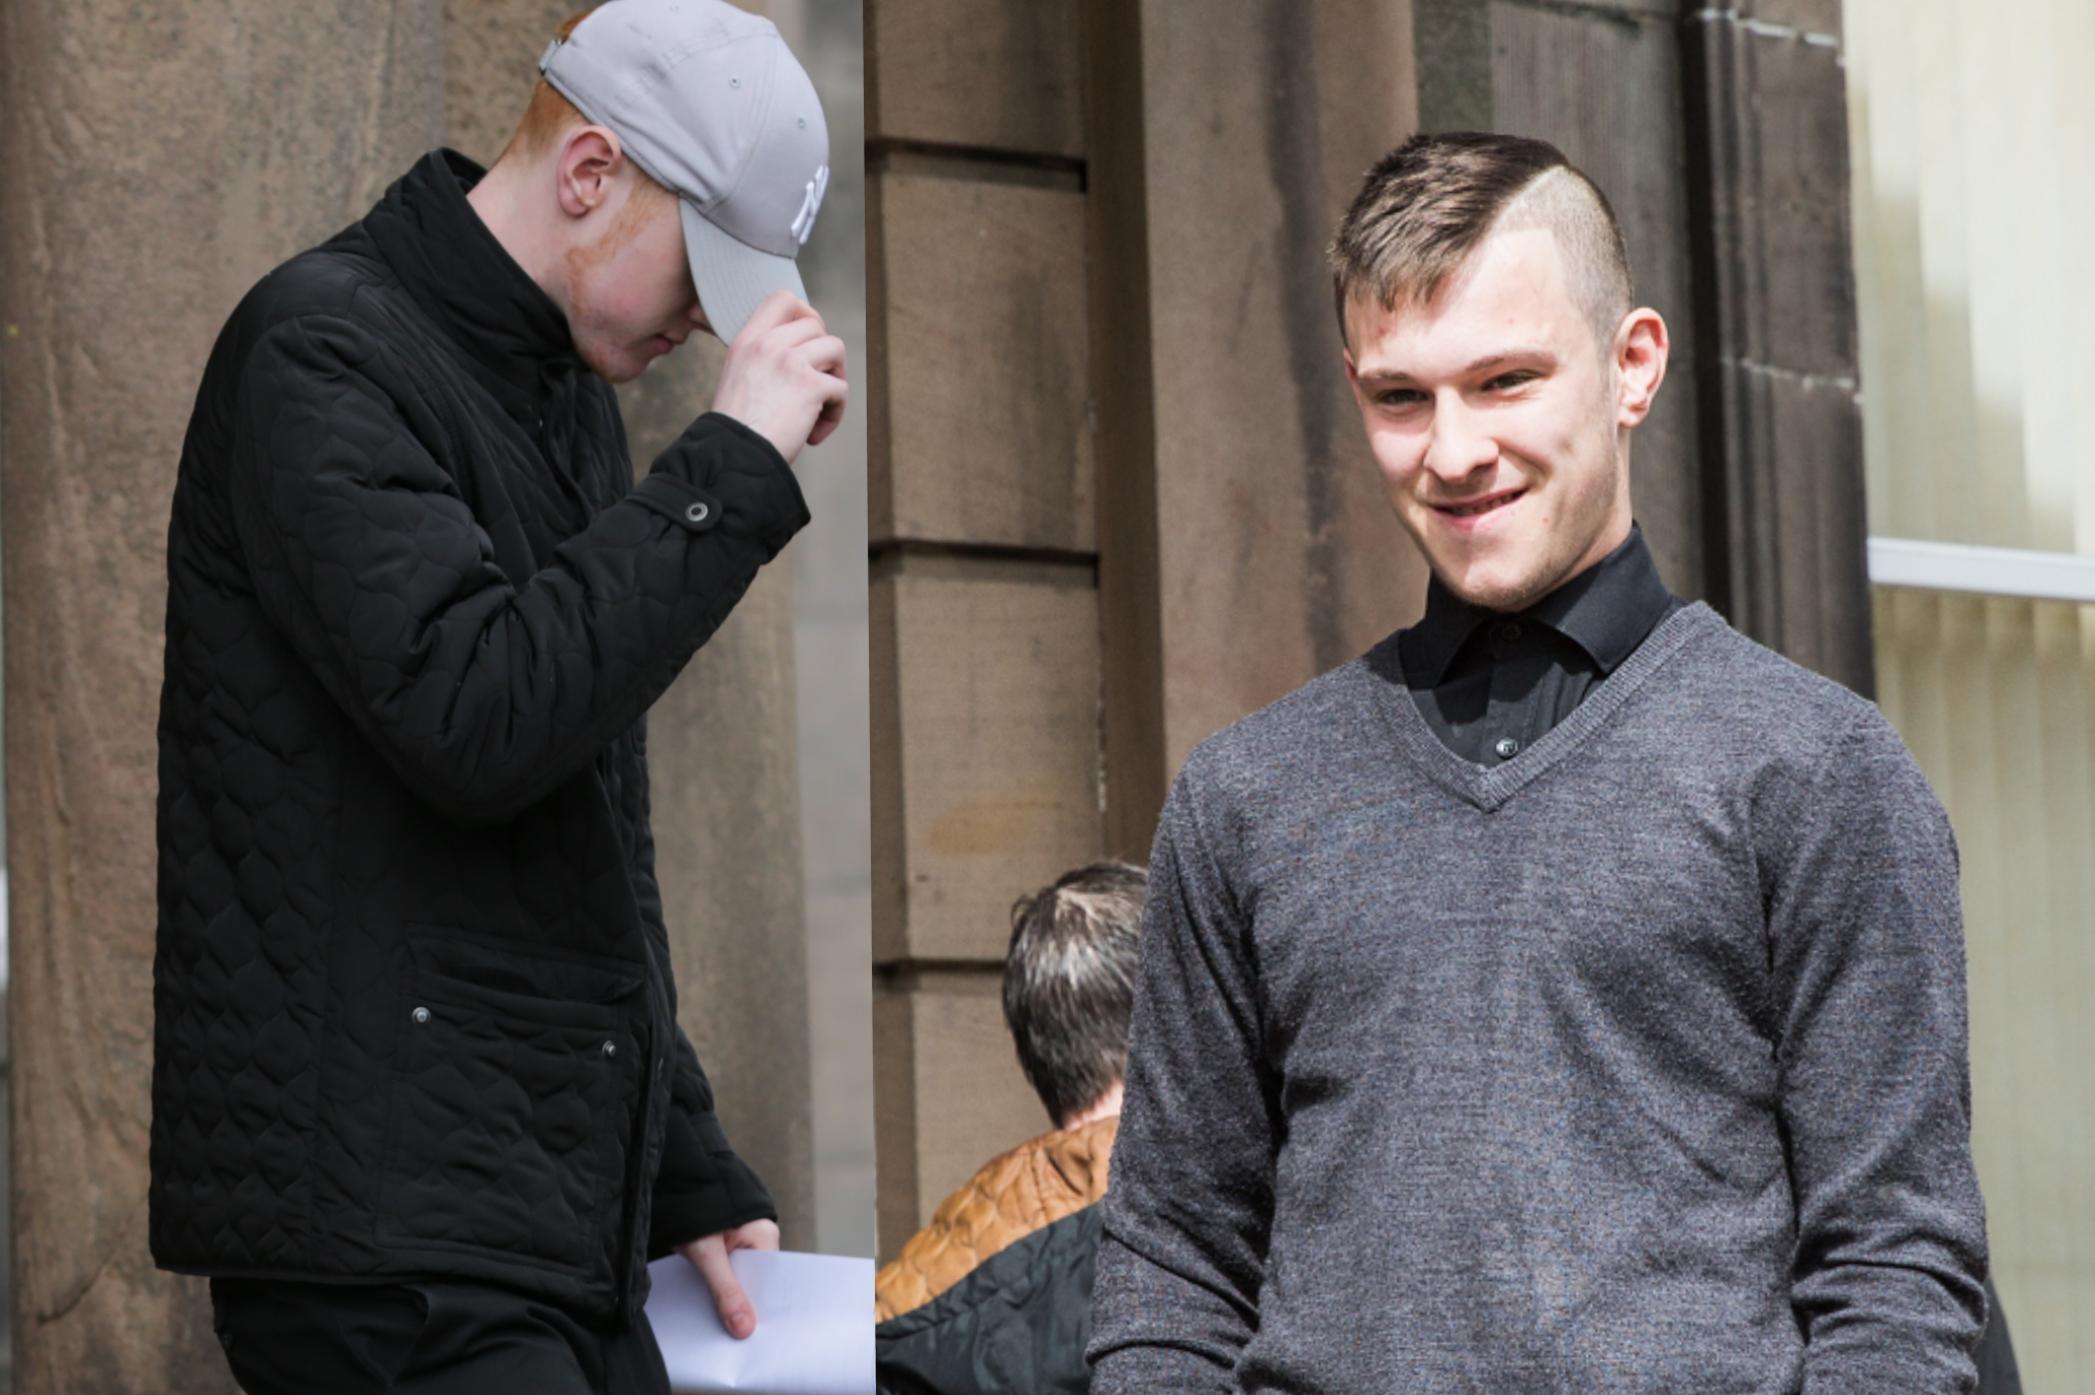 Daniel Innes, left, and Jordan McIsaac have been locked up.